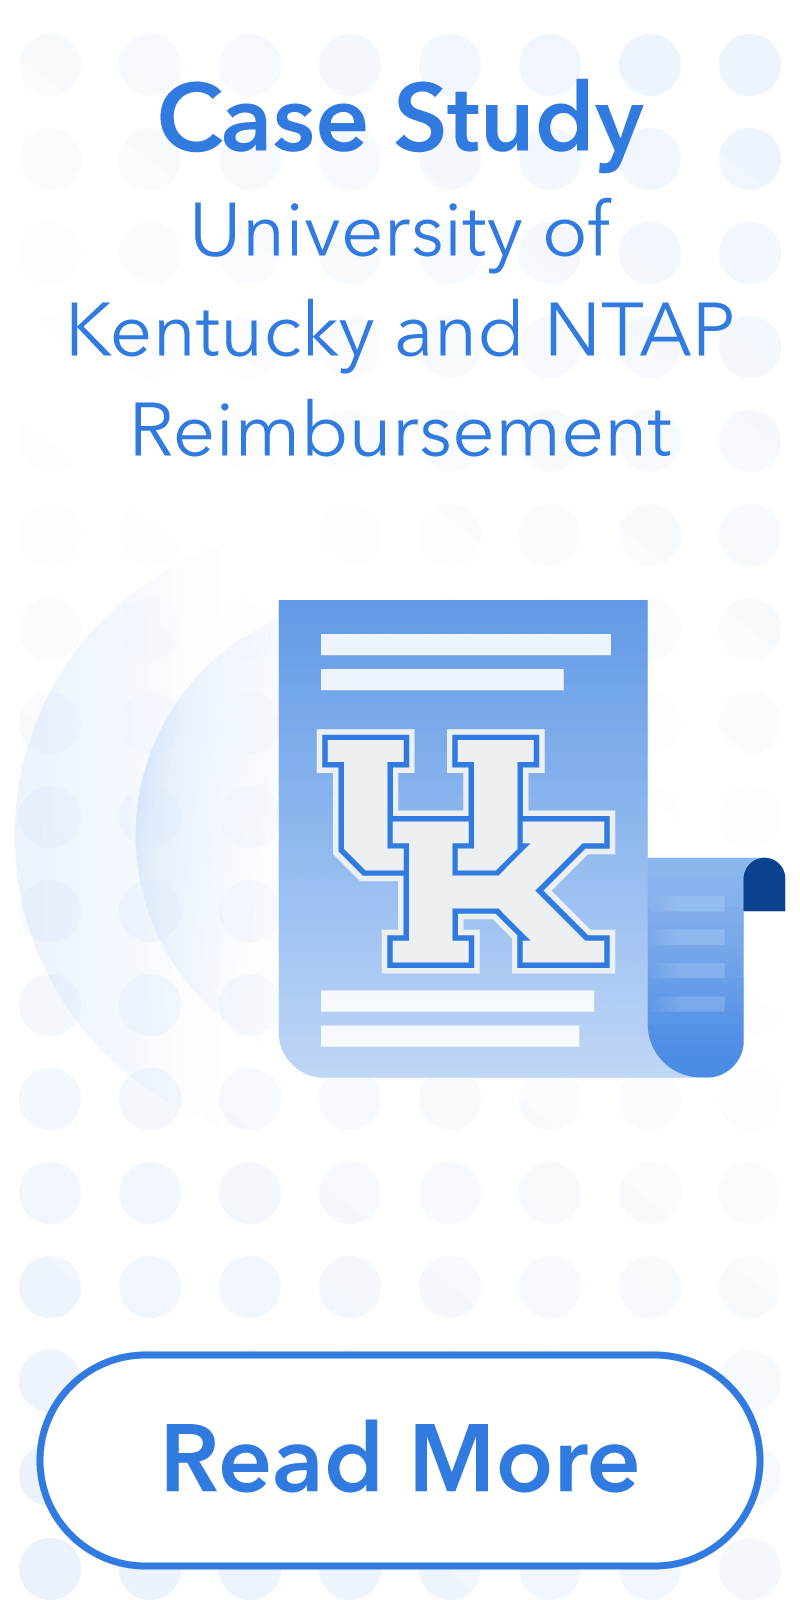 Read the University of Kentucky Case Study on NTAP